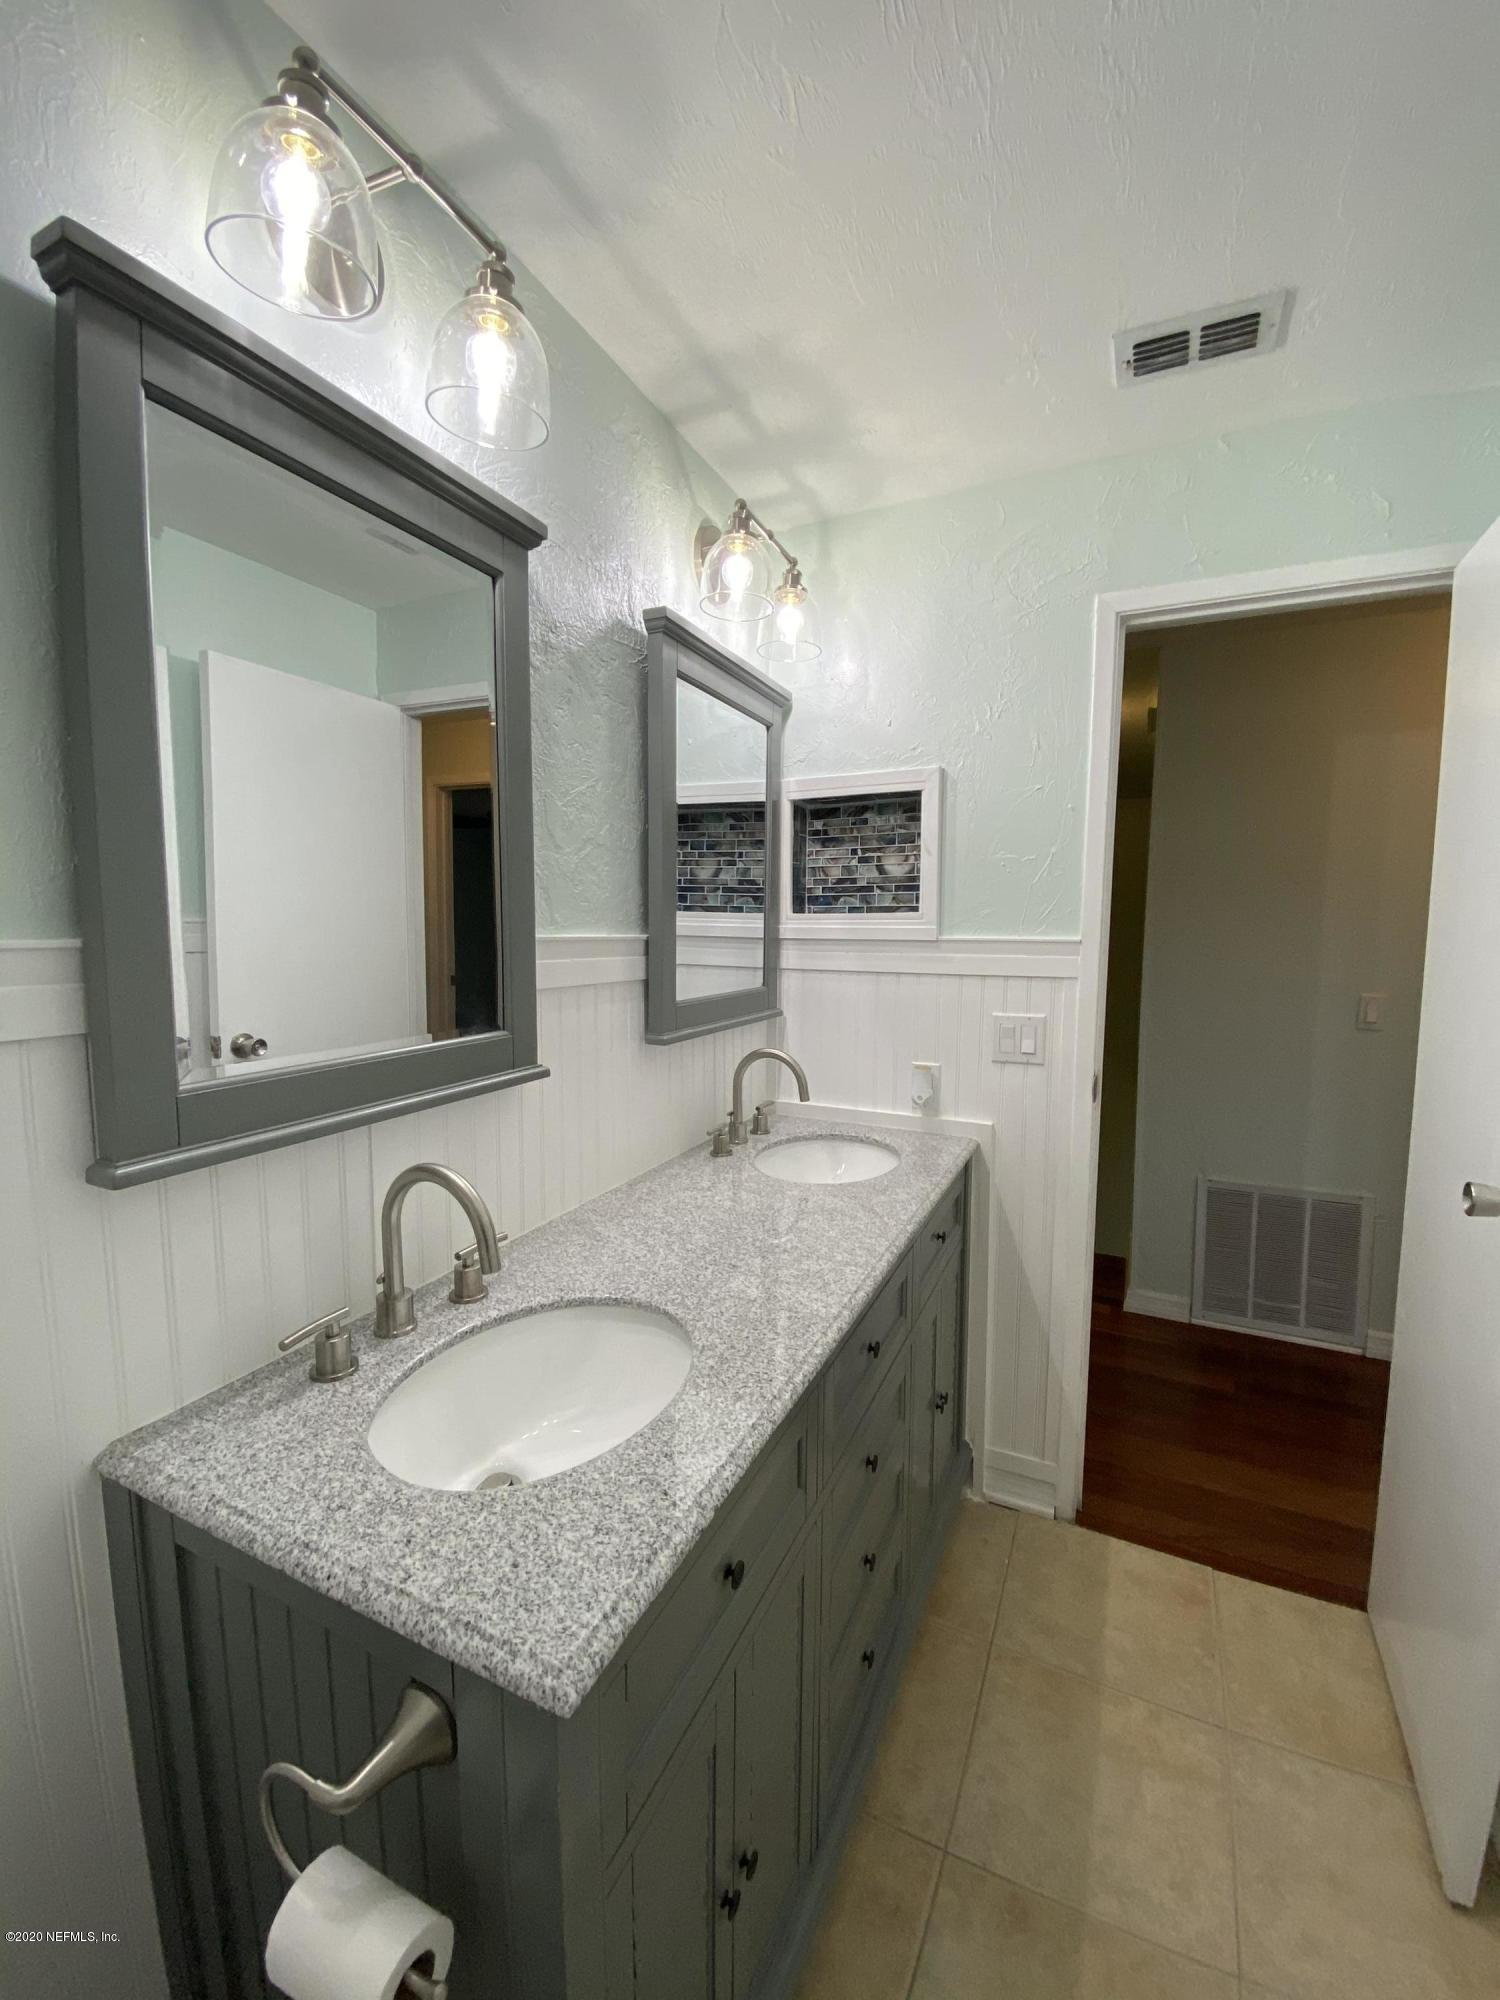 2878 SAND CASTLE, JACKSONVILLE, FLORIDA 32233, 3 Bedrooms Bedrooms, ,2 BathroomsBathrooms,Rental,For Rent,SAND CASTLE,1082440